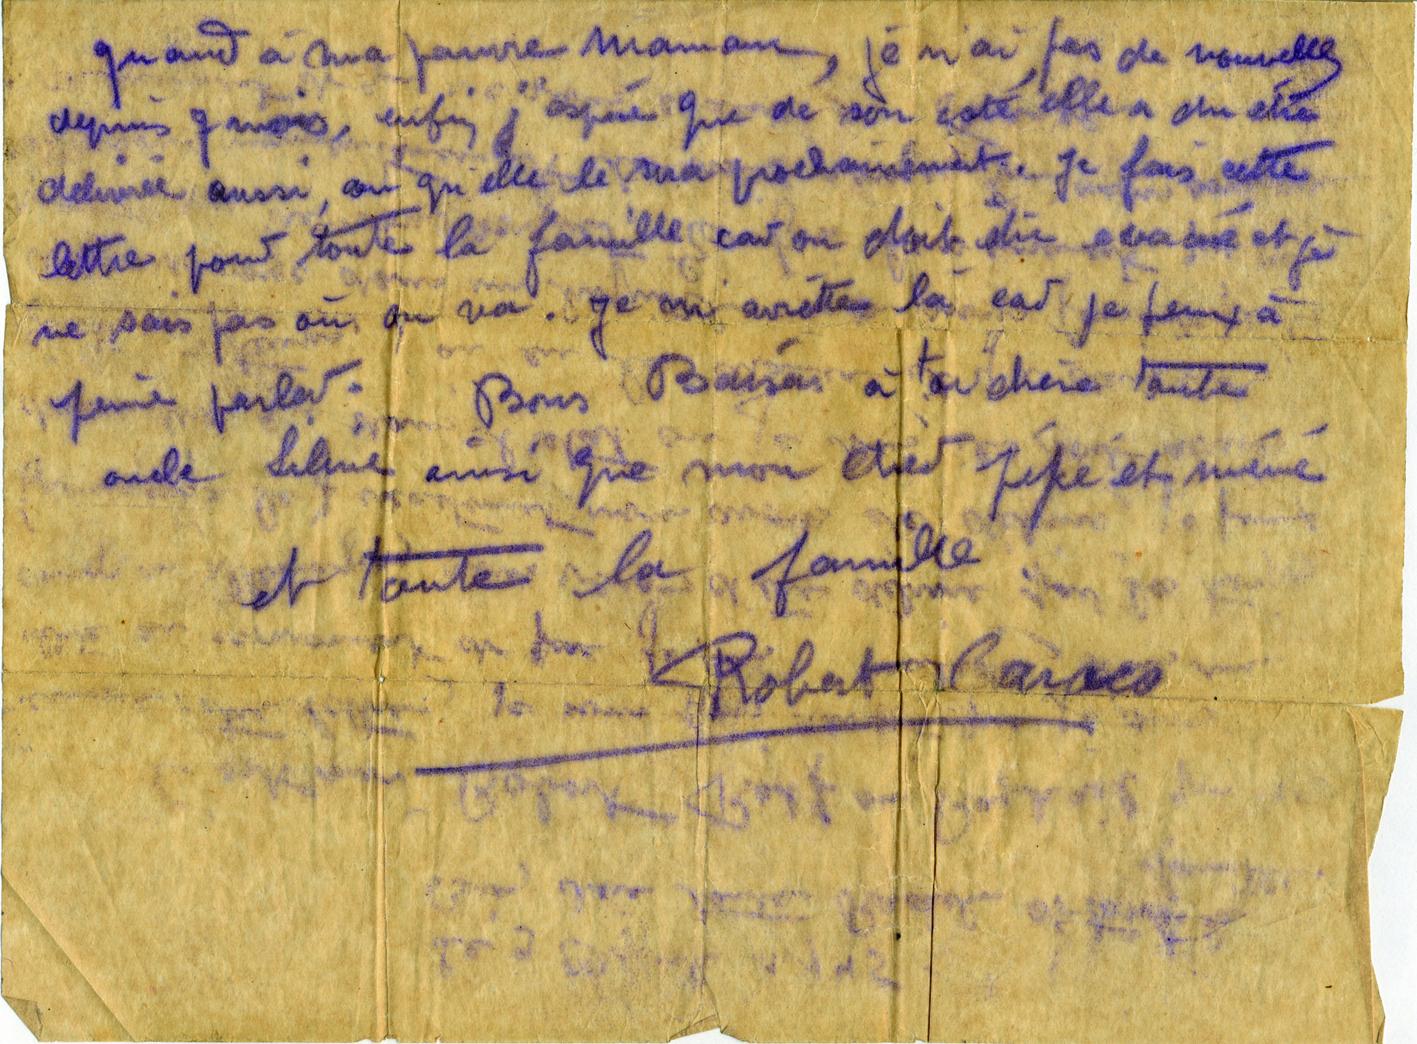 Caraco-Raphael-12 (Lettre)